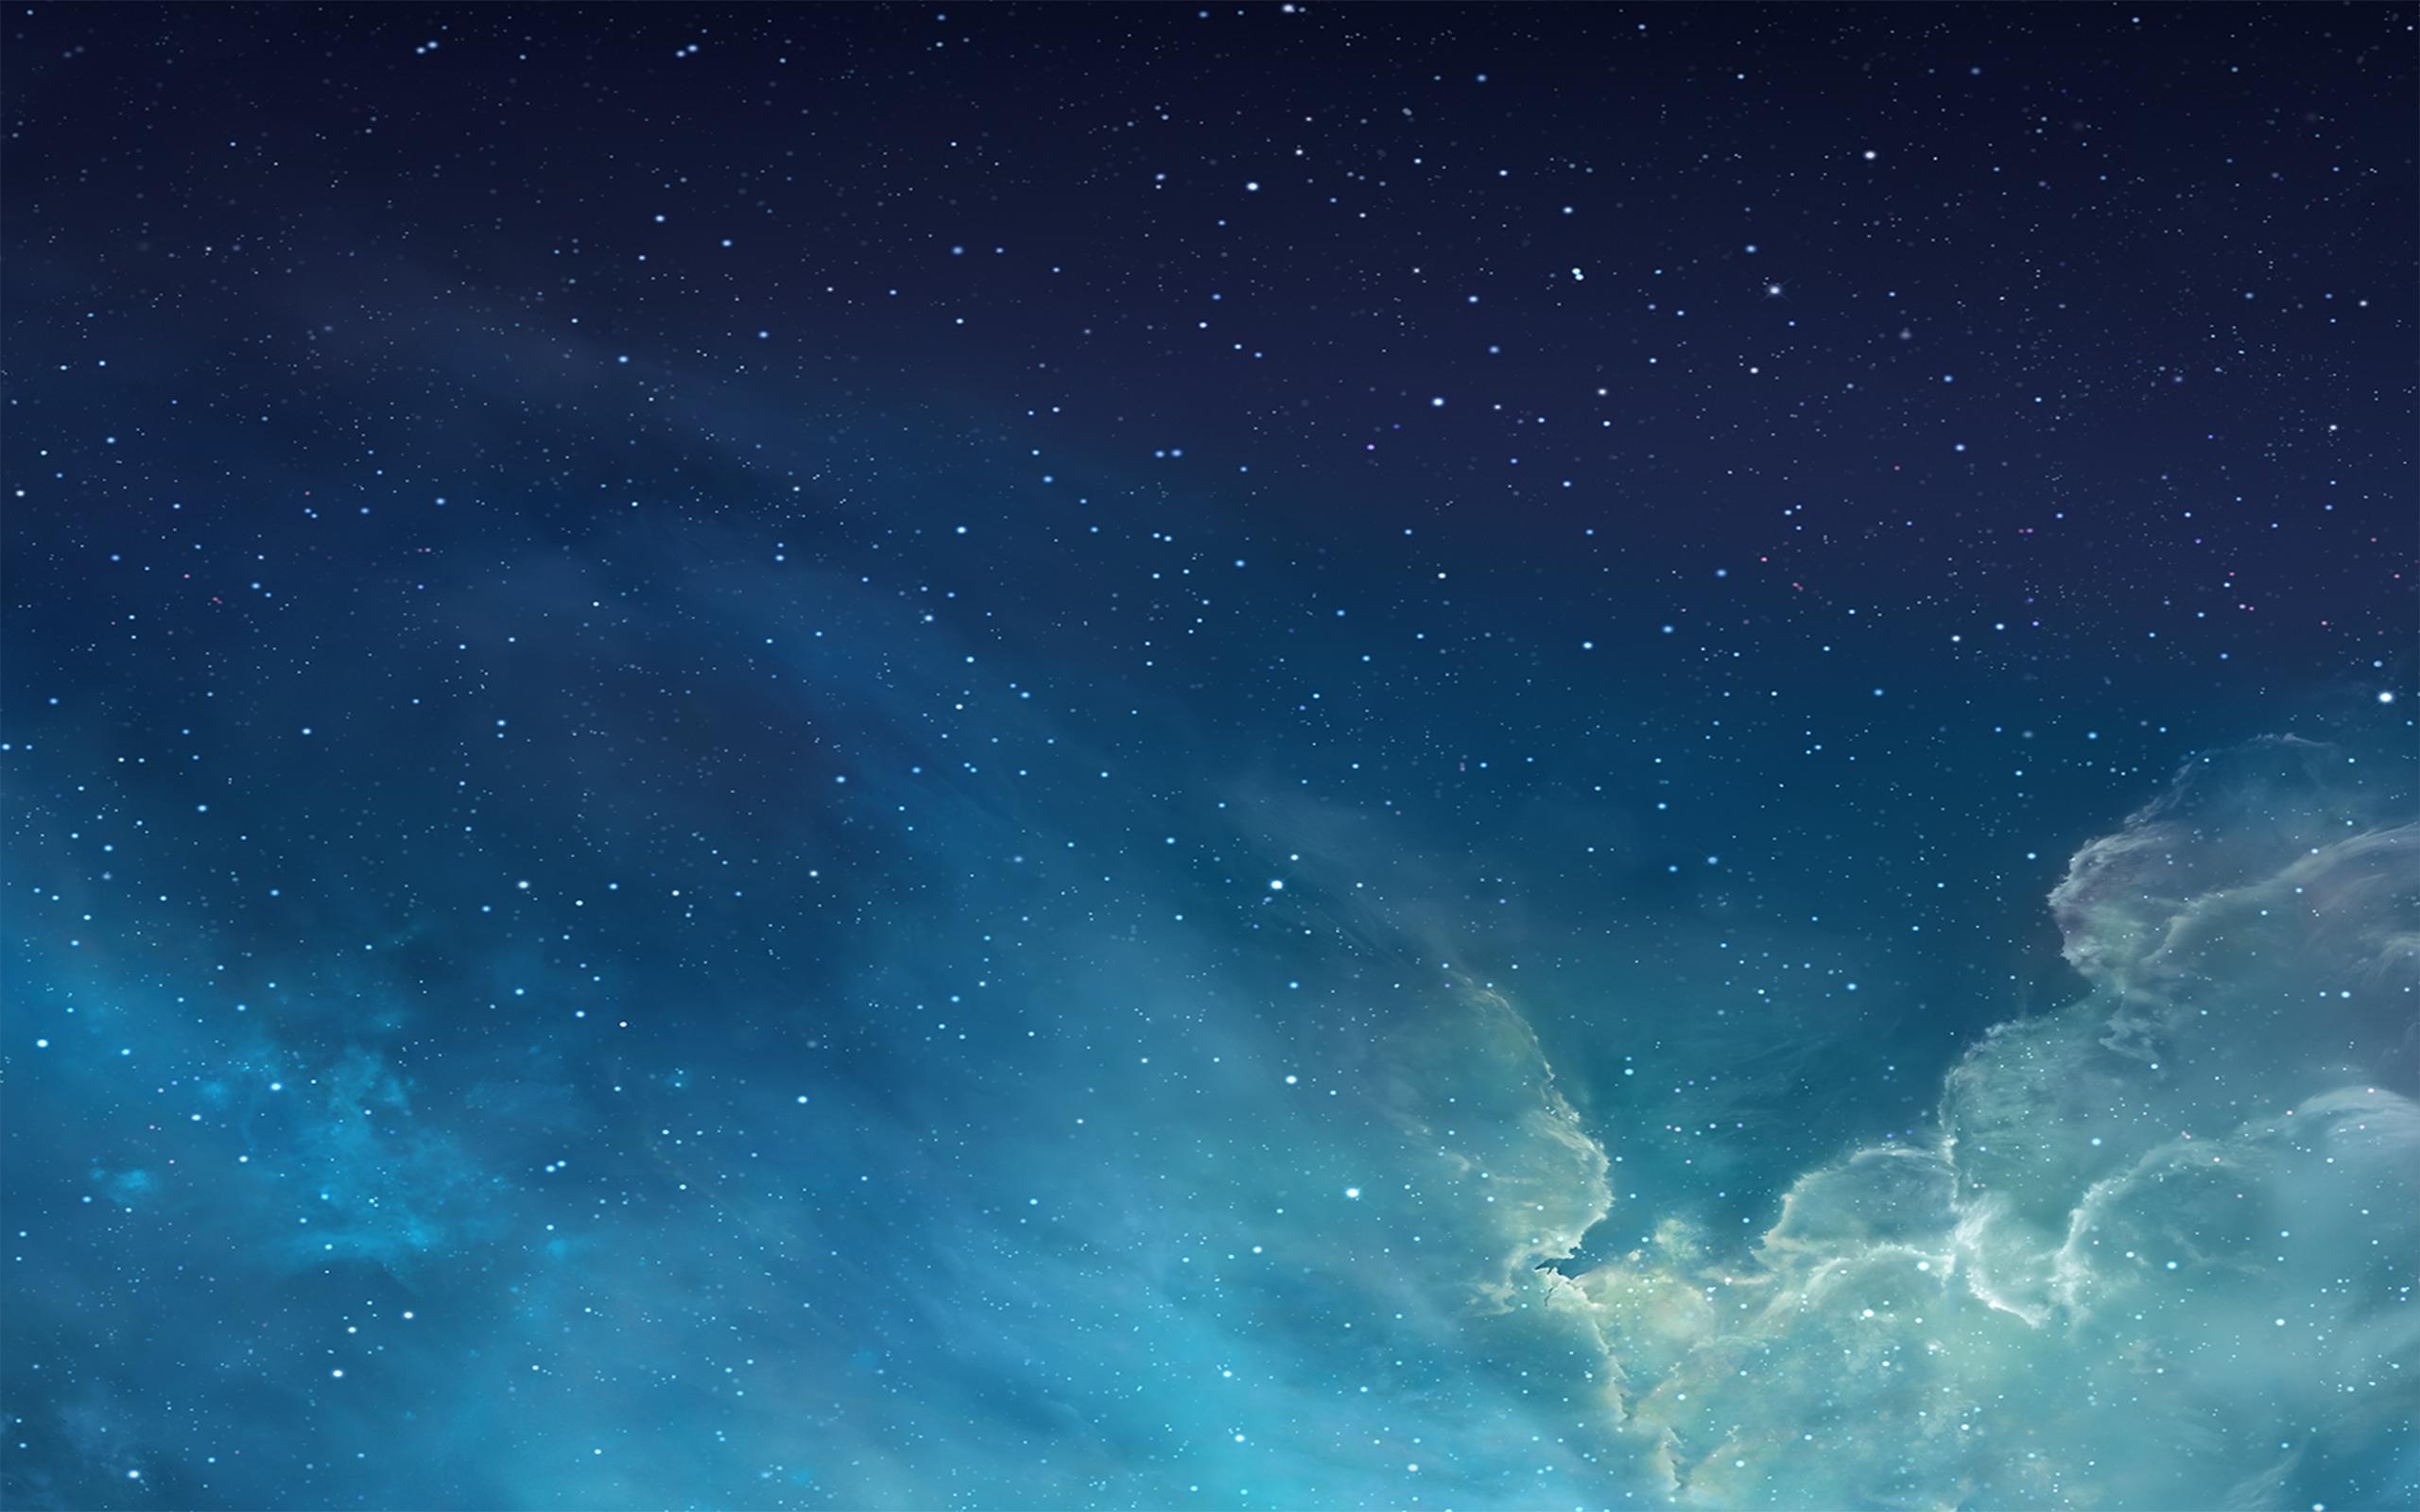 Night Sky Wallpaper Tablet  HD Desktop Wallpapers 4k